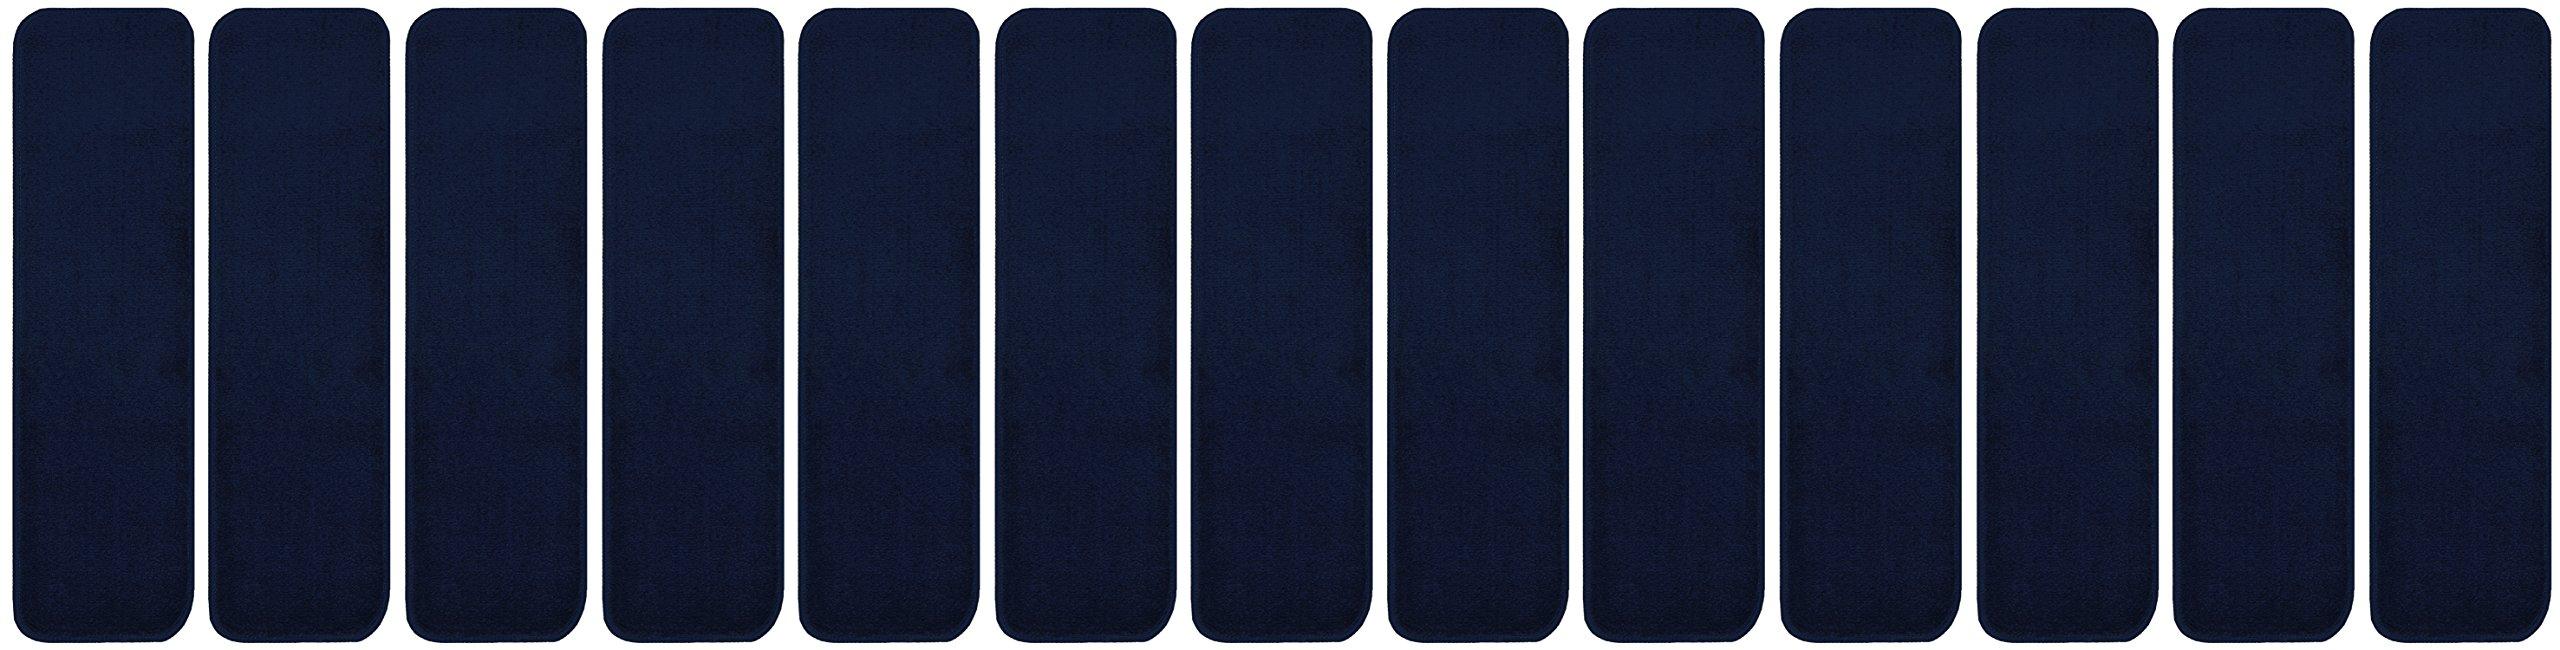 RugStylesOnline TRENDY-ST-8X30-NAVY-13 Trendy Stair Tread Treads Indoor Skid Slip Resistant Carpet Stair Tread Treads Machine Washable 8 ½'' W x 30'' L, Royal Navy Blue, Set of 13